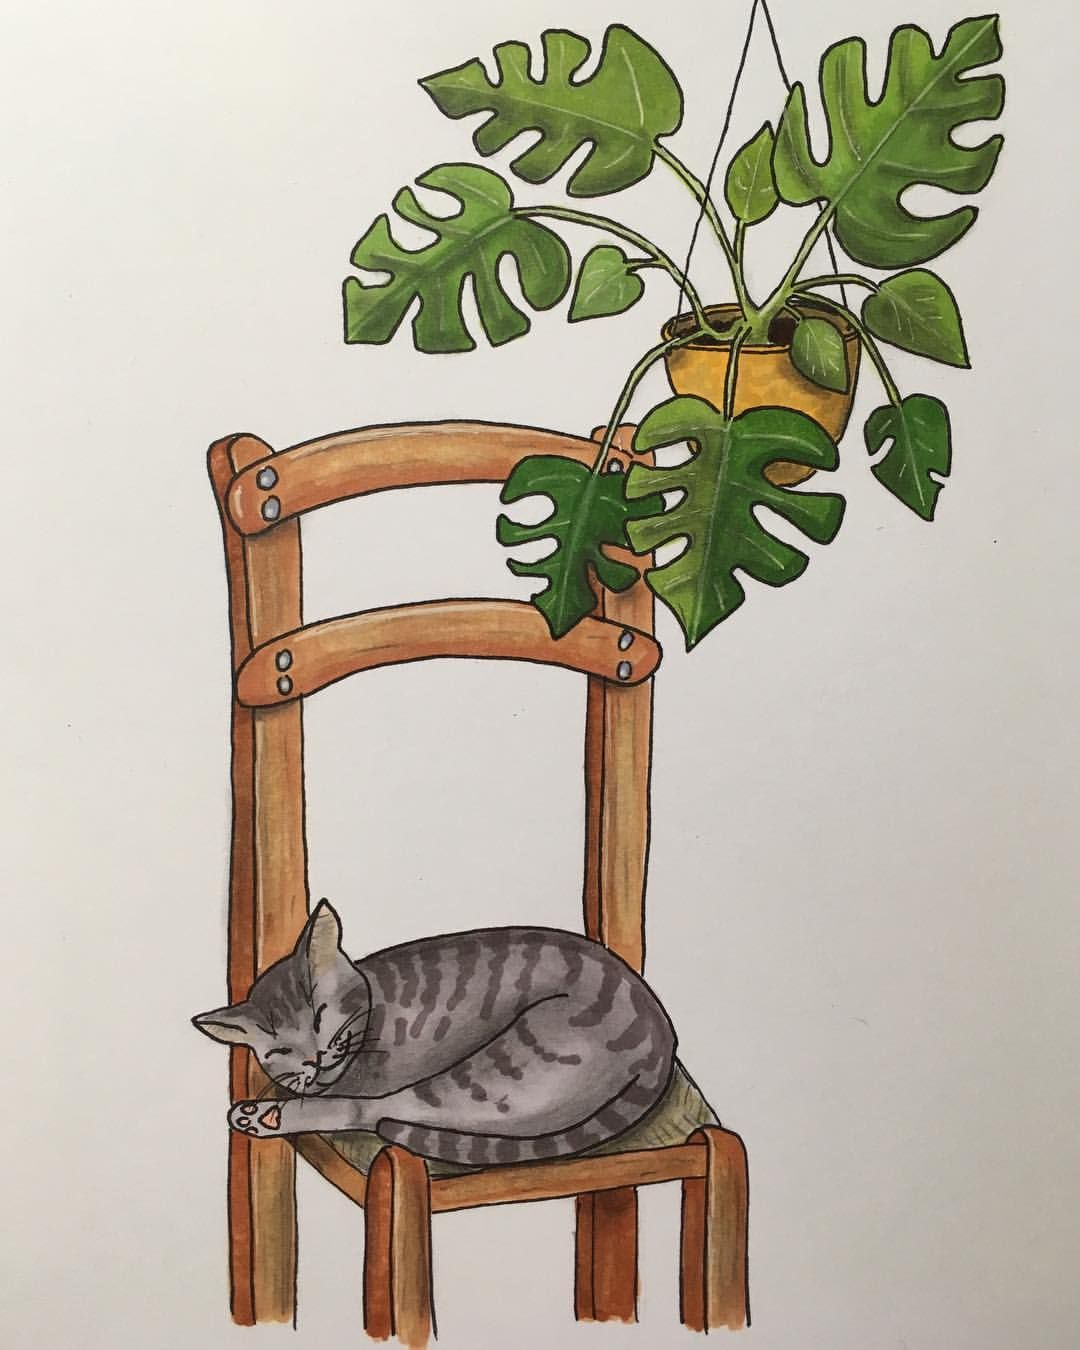 360 Vind Ik Leuks 8 Reacties Plants Illustrations Drawingplantlady Op Instagram Monstera Cat Drawin Amazing Art Painting Plant Art Hawaiian Art